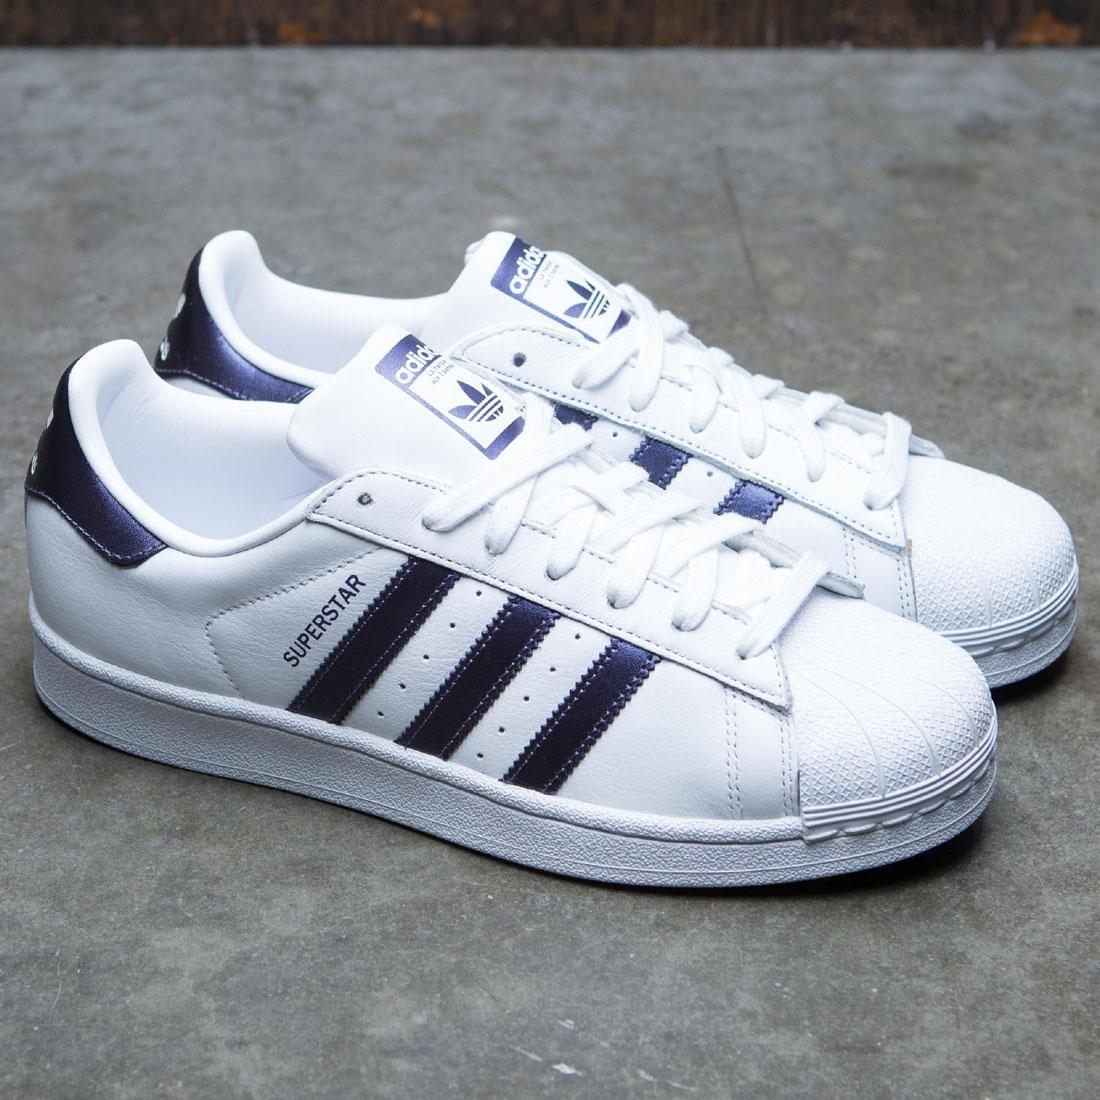 Adidas Originals Superstar Women CG5464